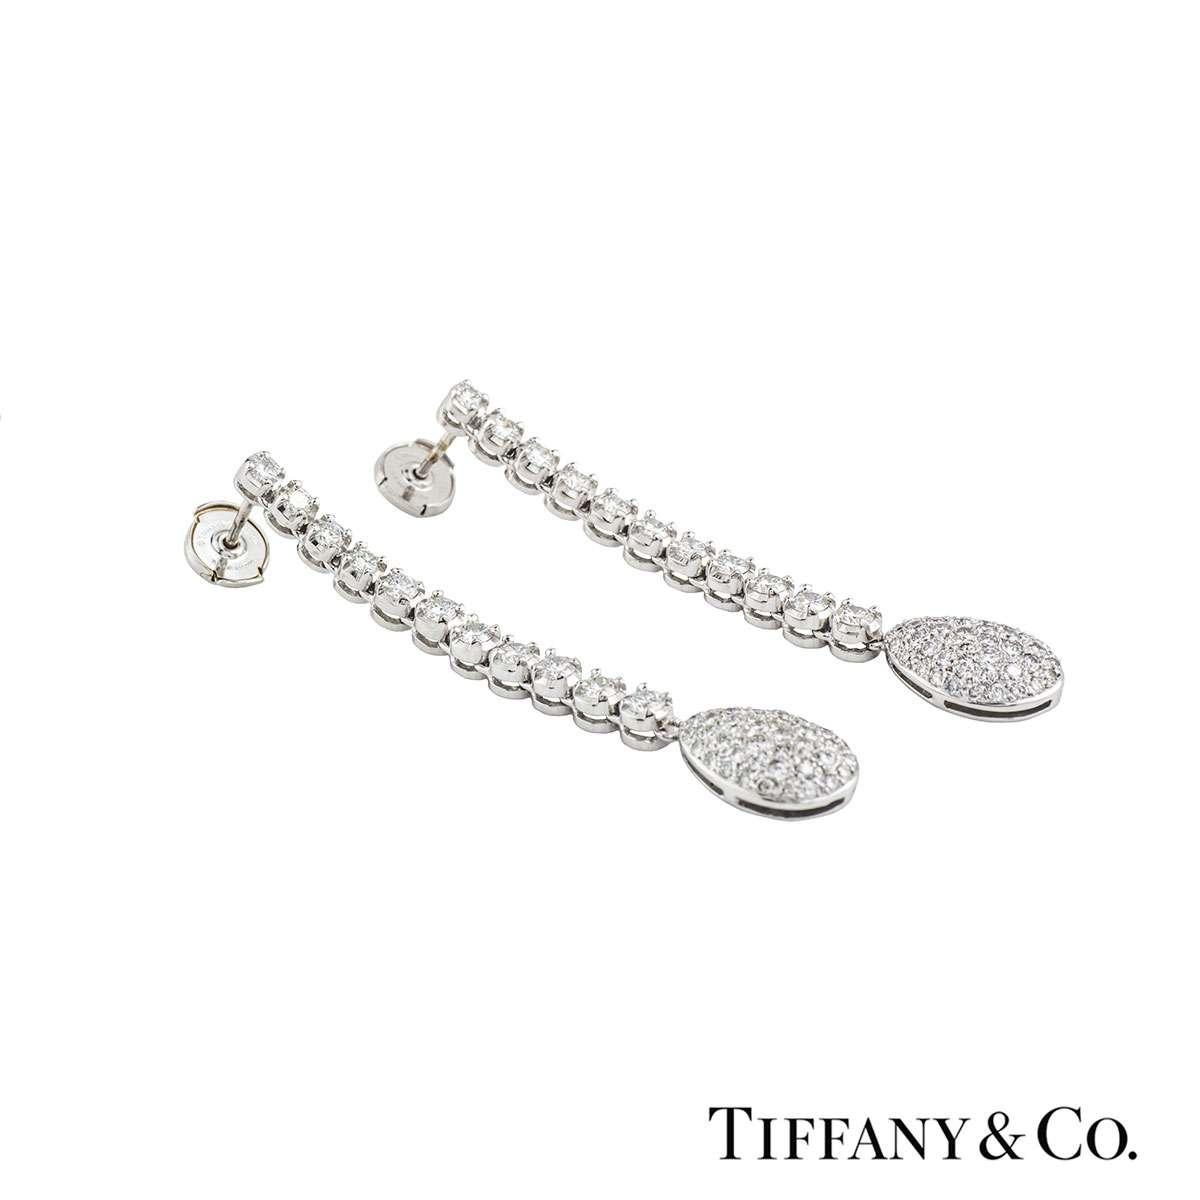 Tiffany Co Diamond Platinum Drop Earrings 5 82ct